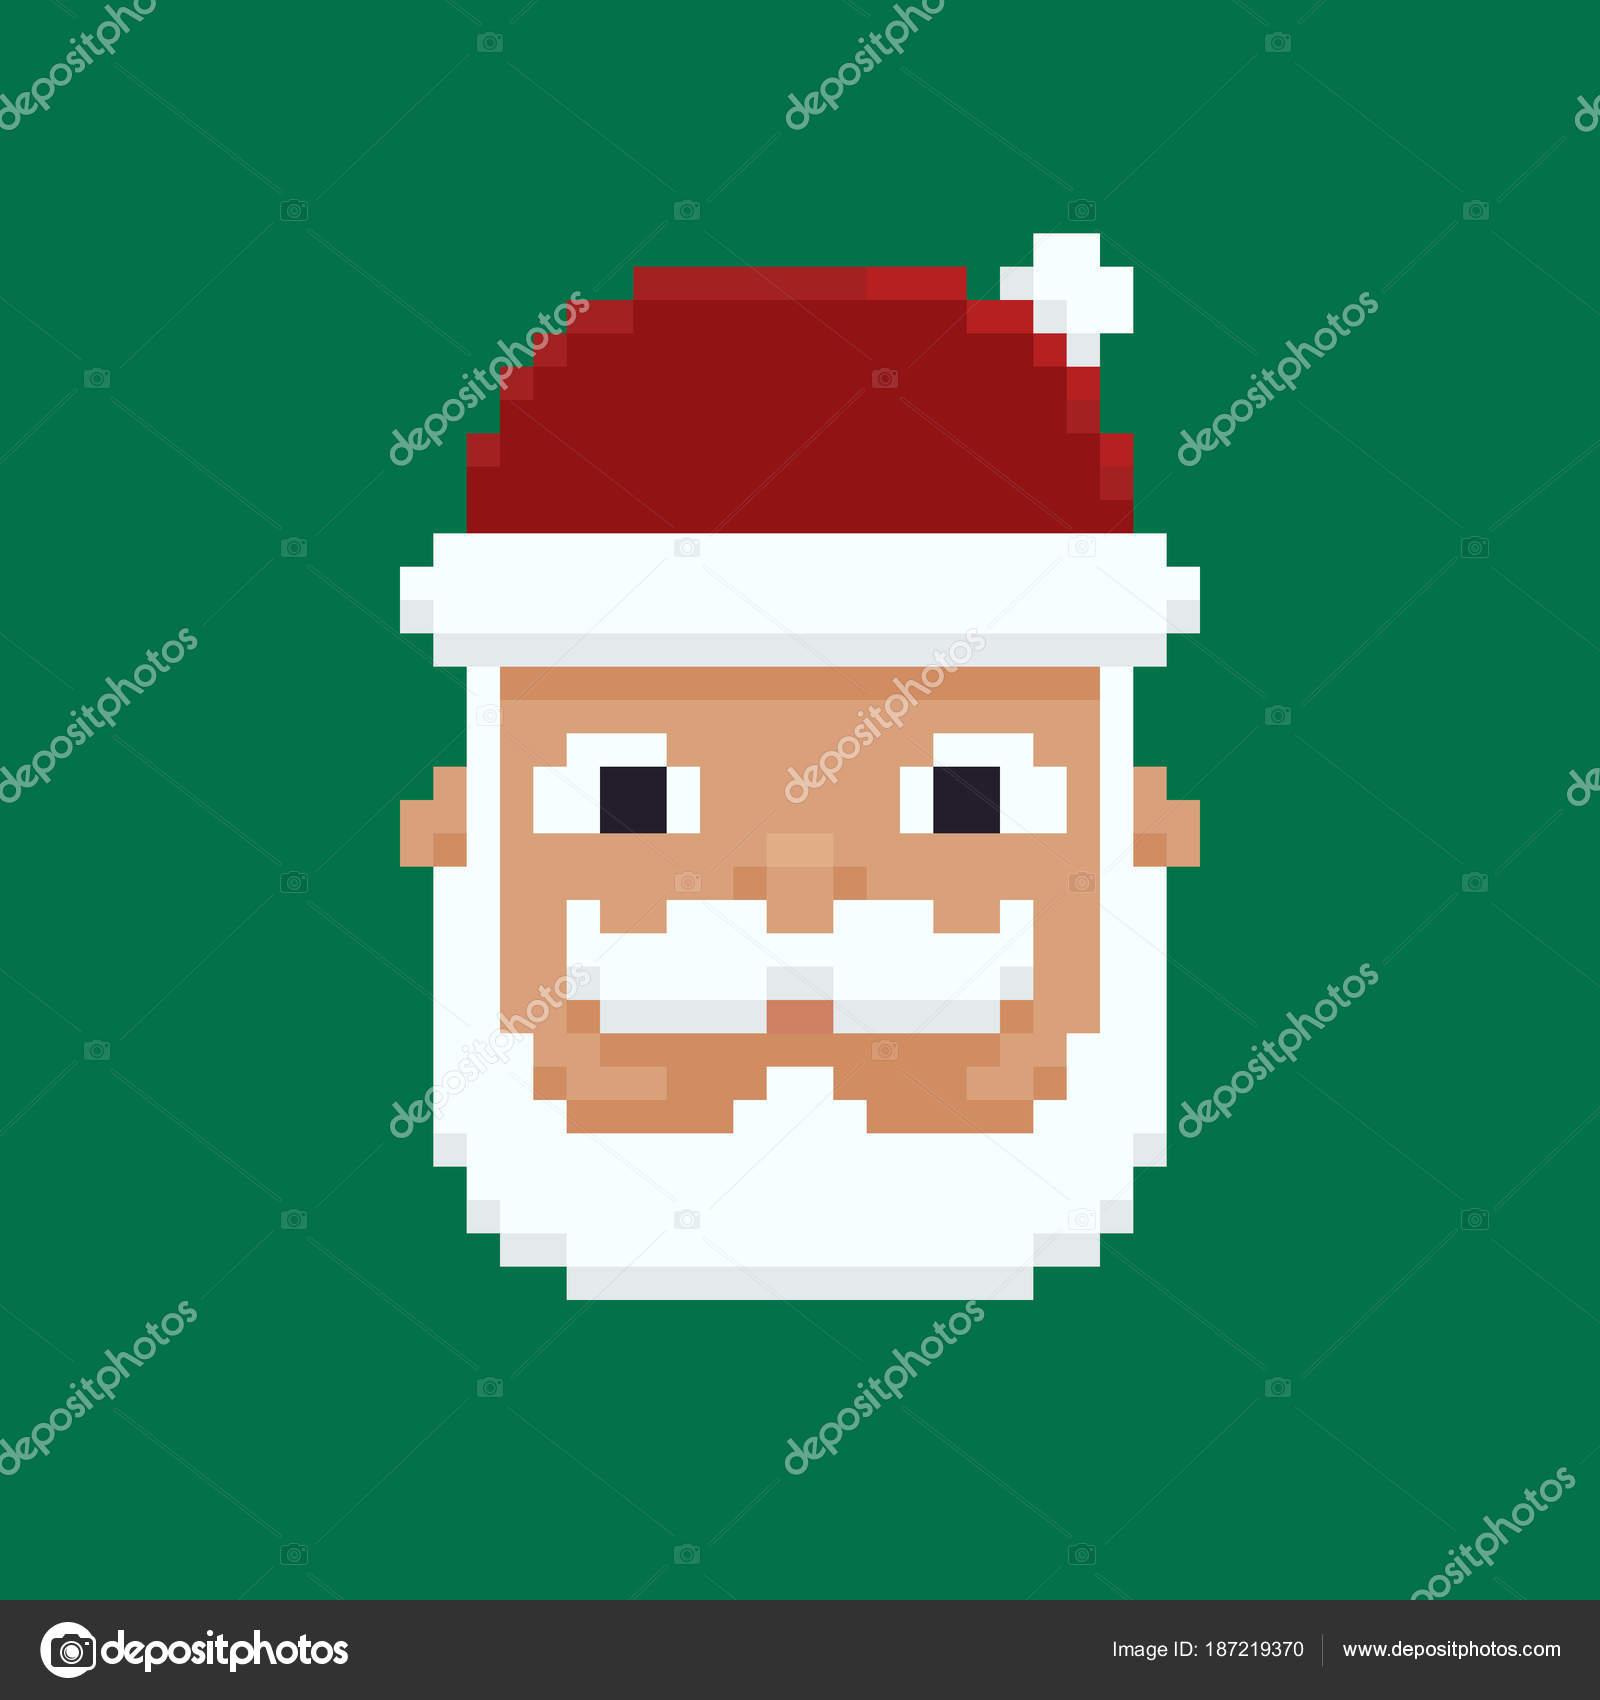 Pixel Art Santa Image Vectorielle Chuckchee 187219370